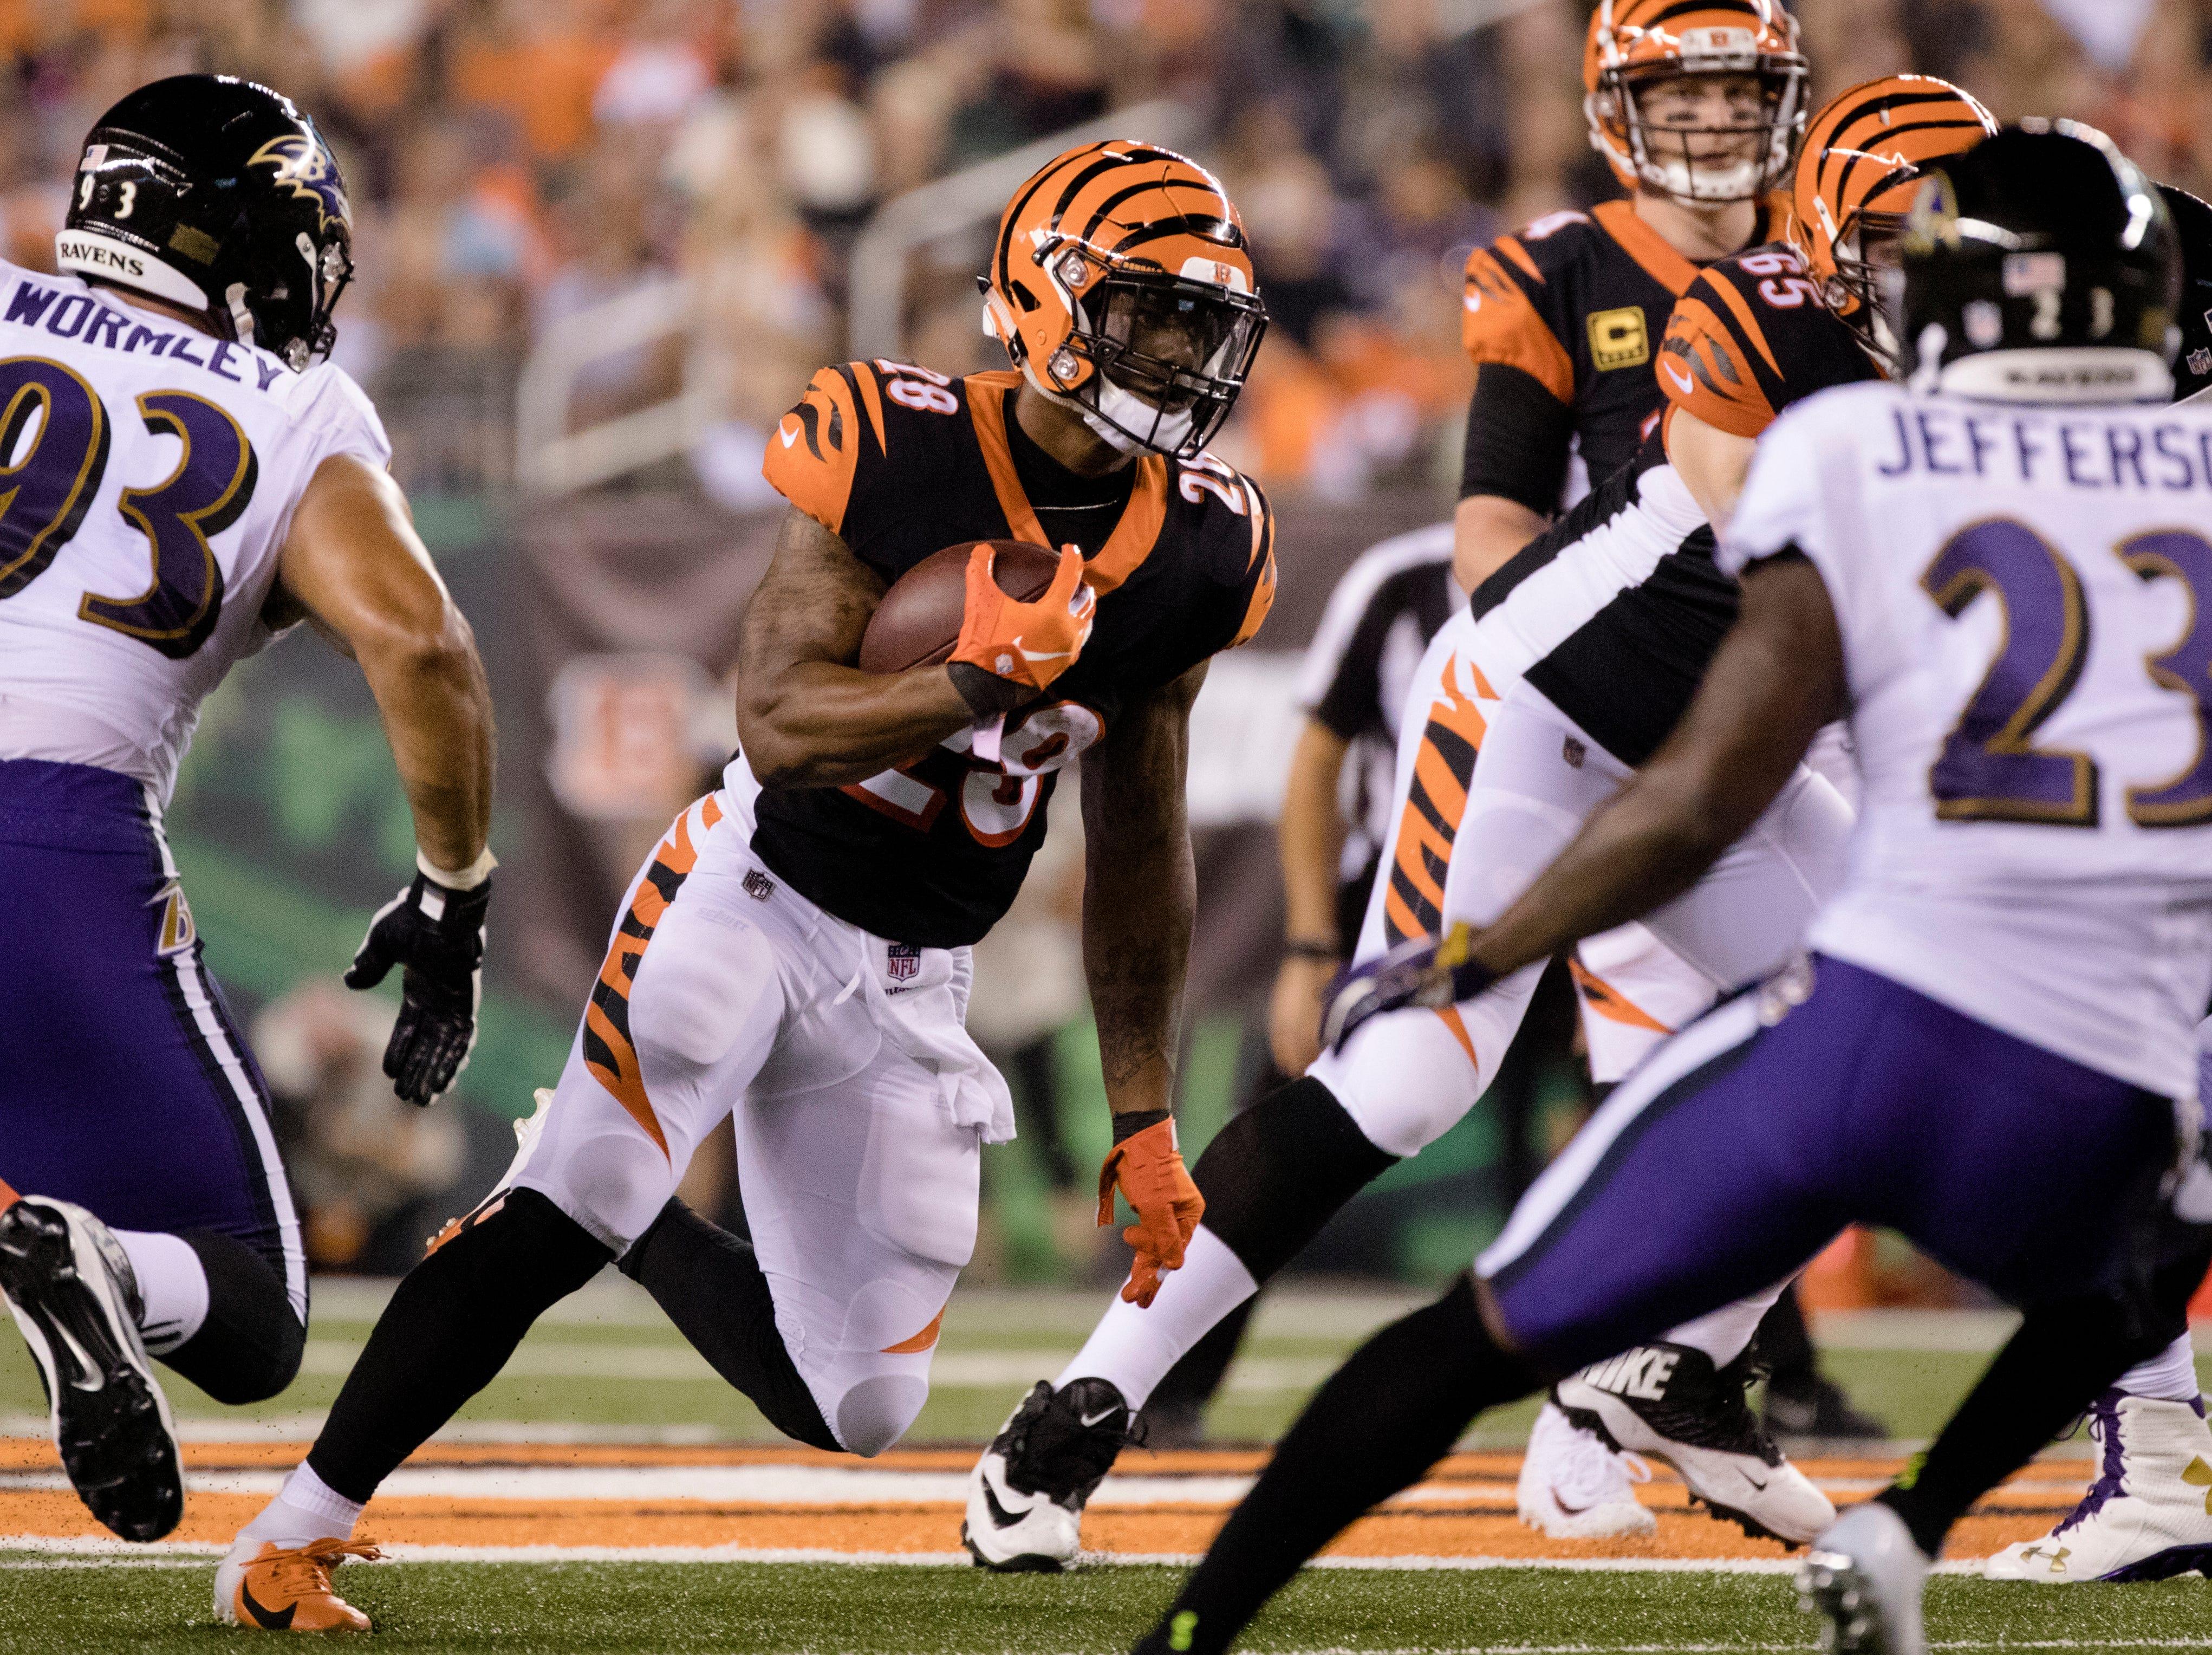 Cincinnati Bengals running back Joe Mixon (28) runs downfield during the Week 2 NFL game between the Cincinnati Bengals and the Baltimore Ravens, Thursday, Sept. 13, 2018, at Paul Brown Stadium in Cincinnati.